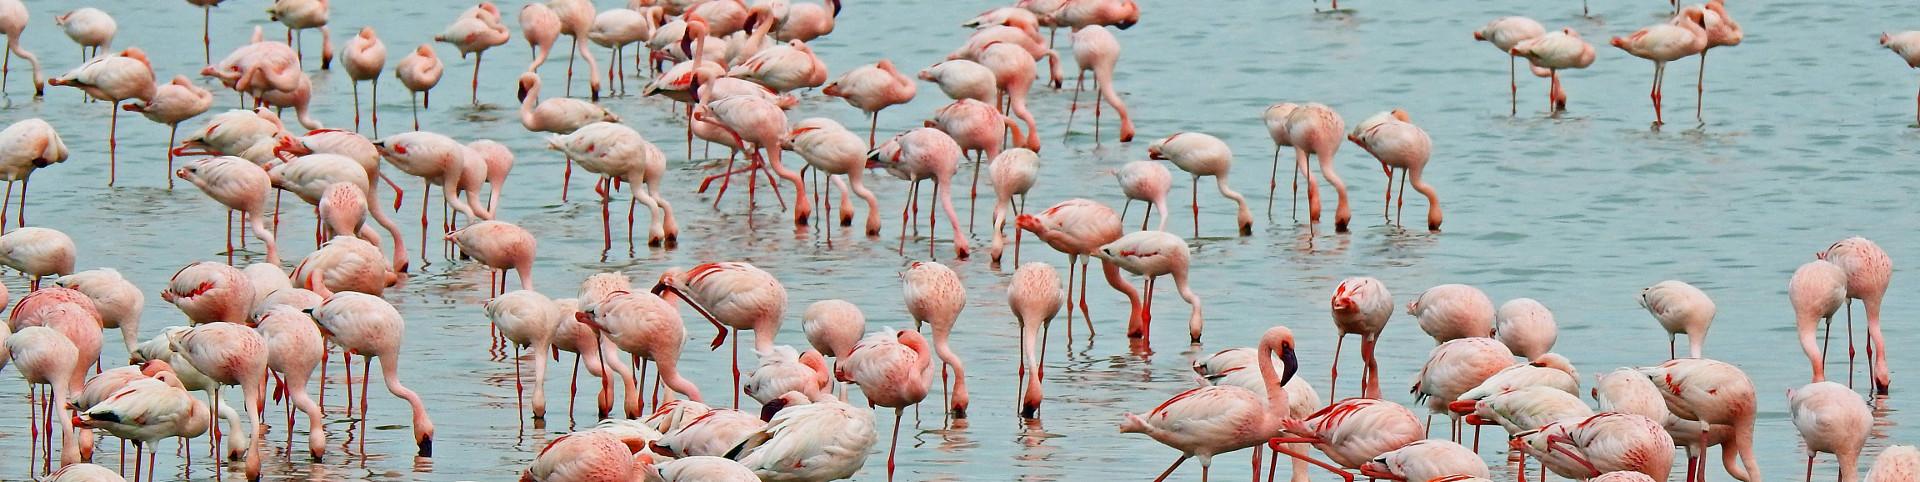 Flamingos_DSCN1045_1920x482